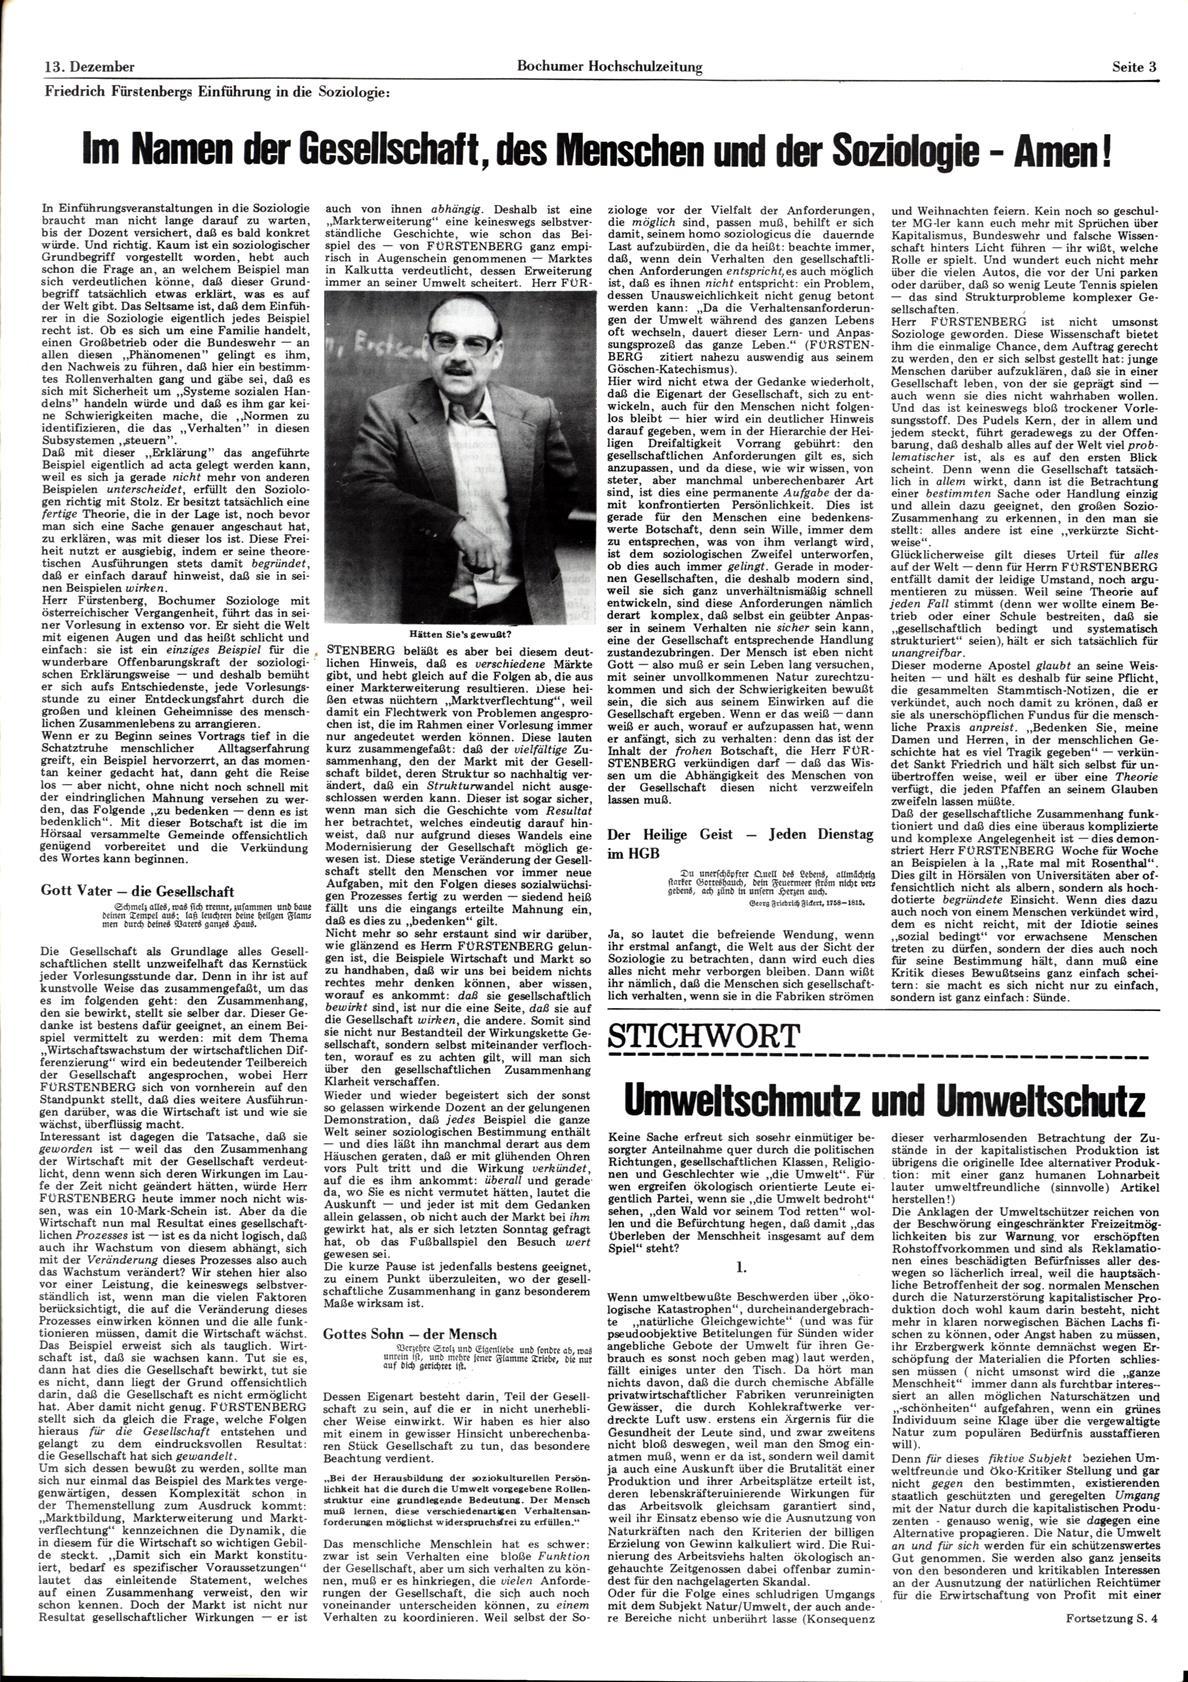 Bochum_BHZ_19831213_083_003